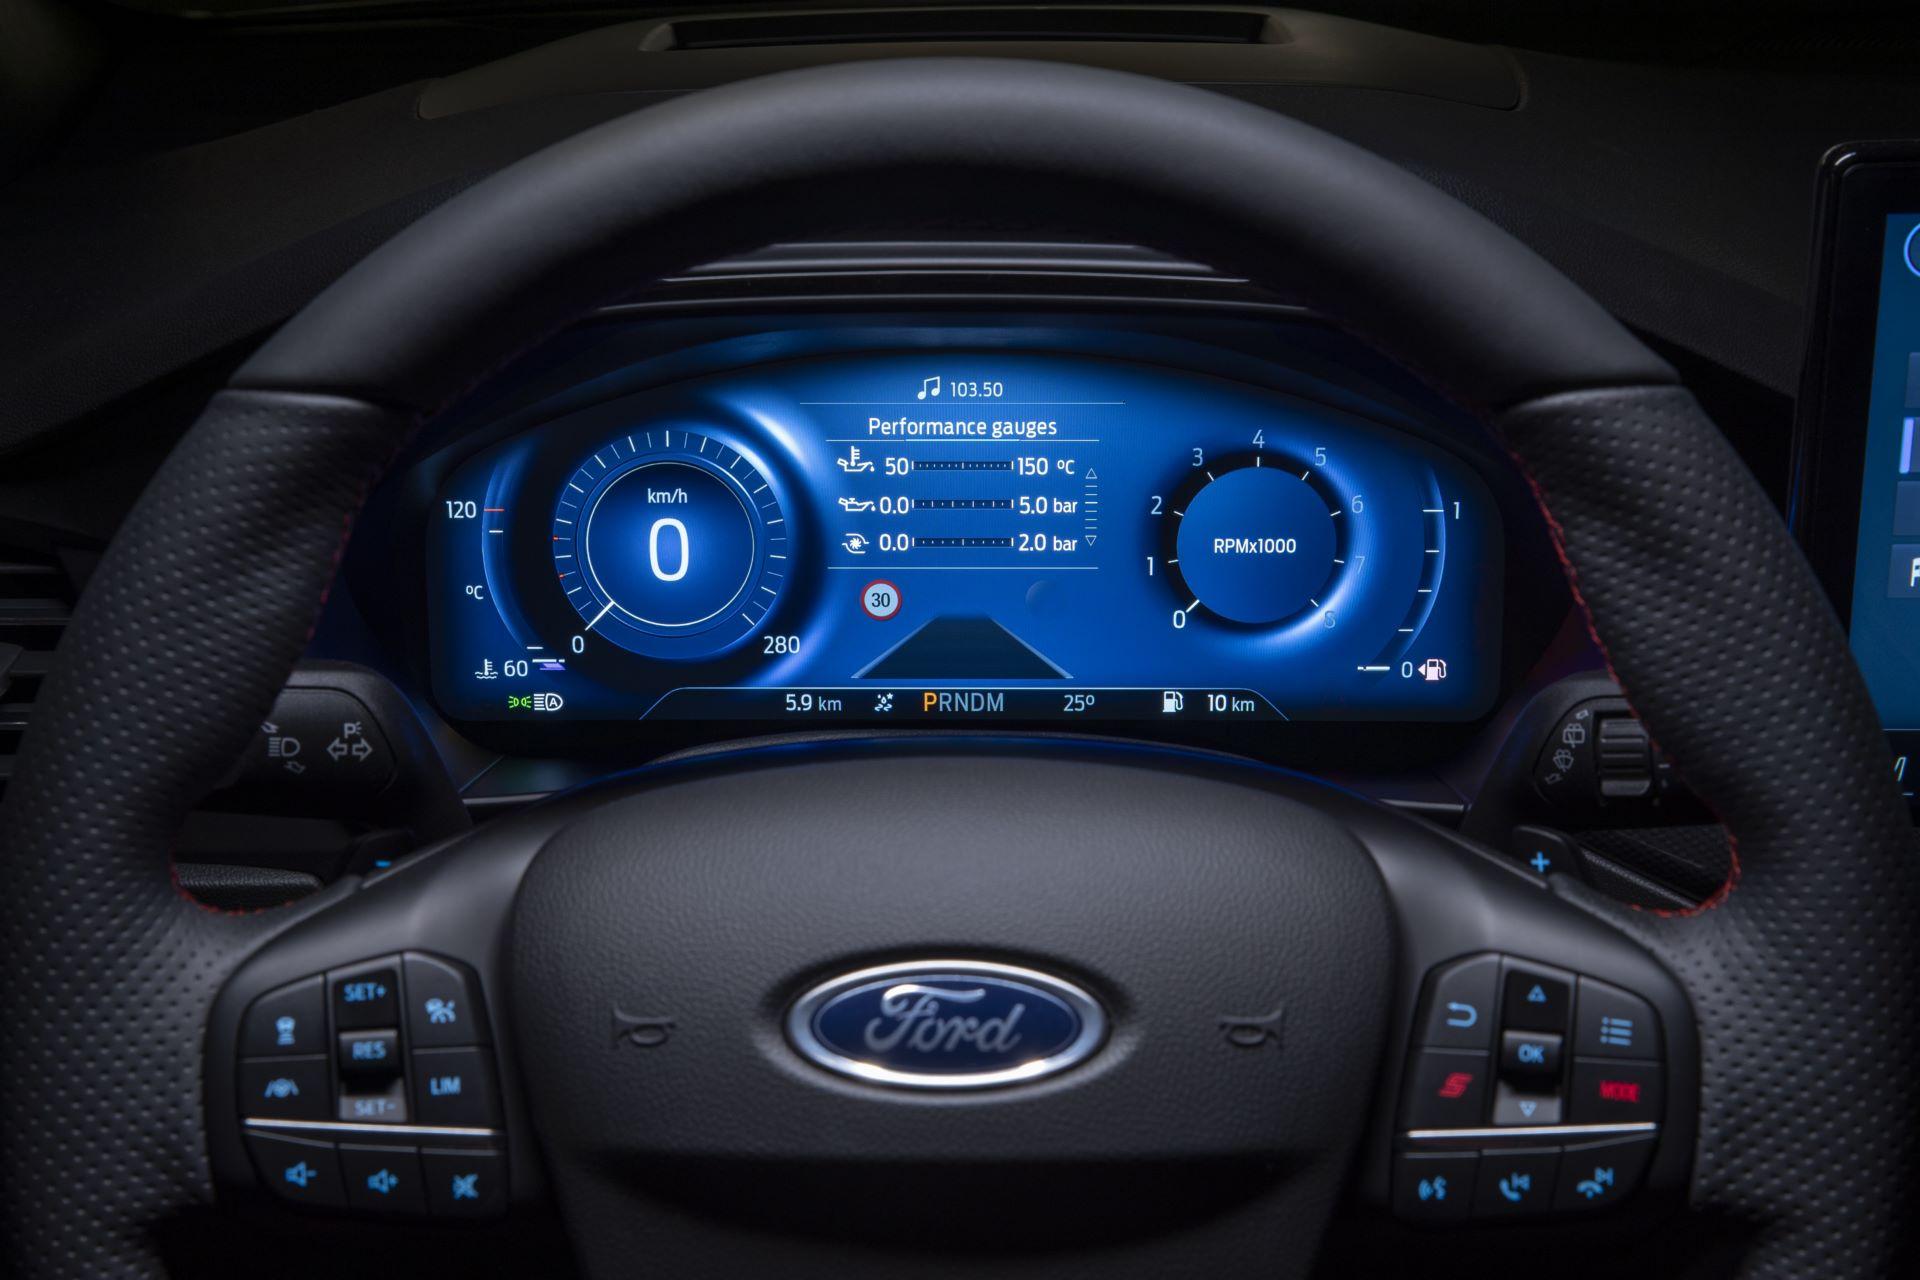 Ford-Focus-ST-facelift-2021-13